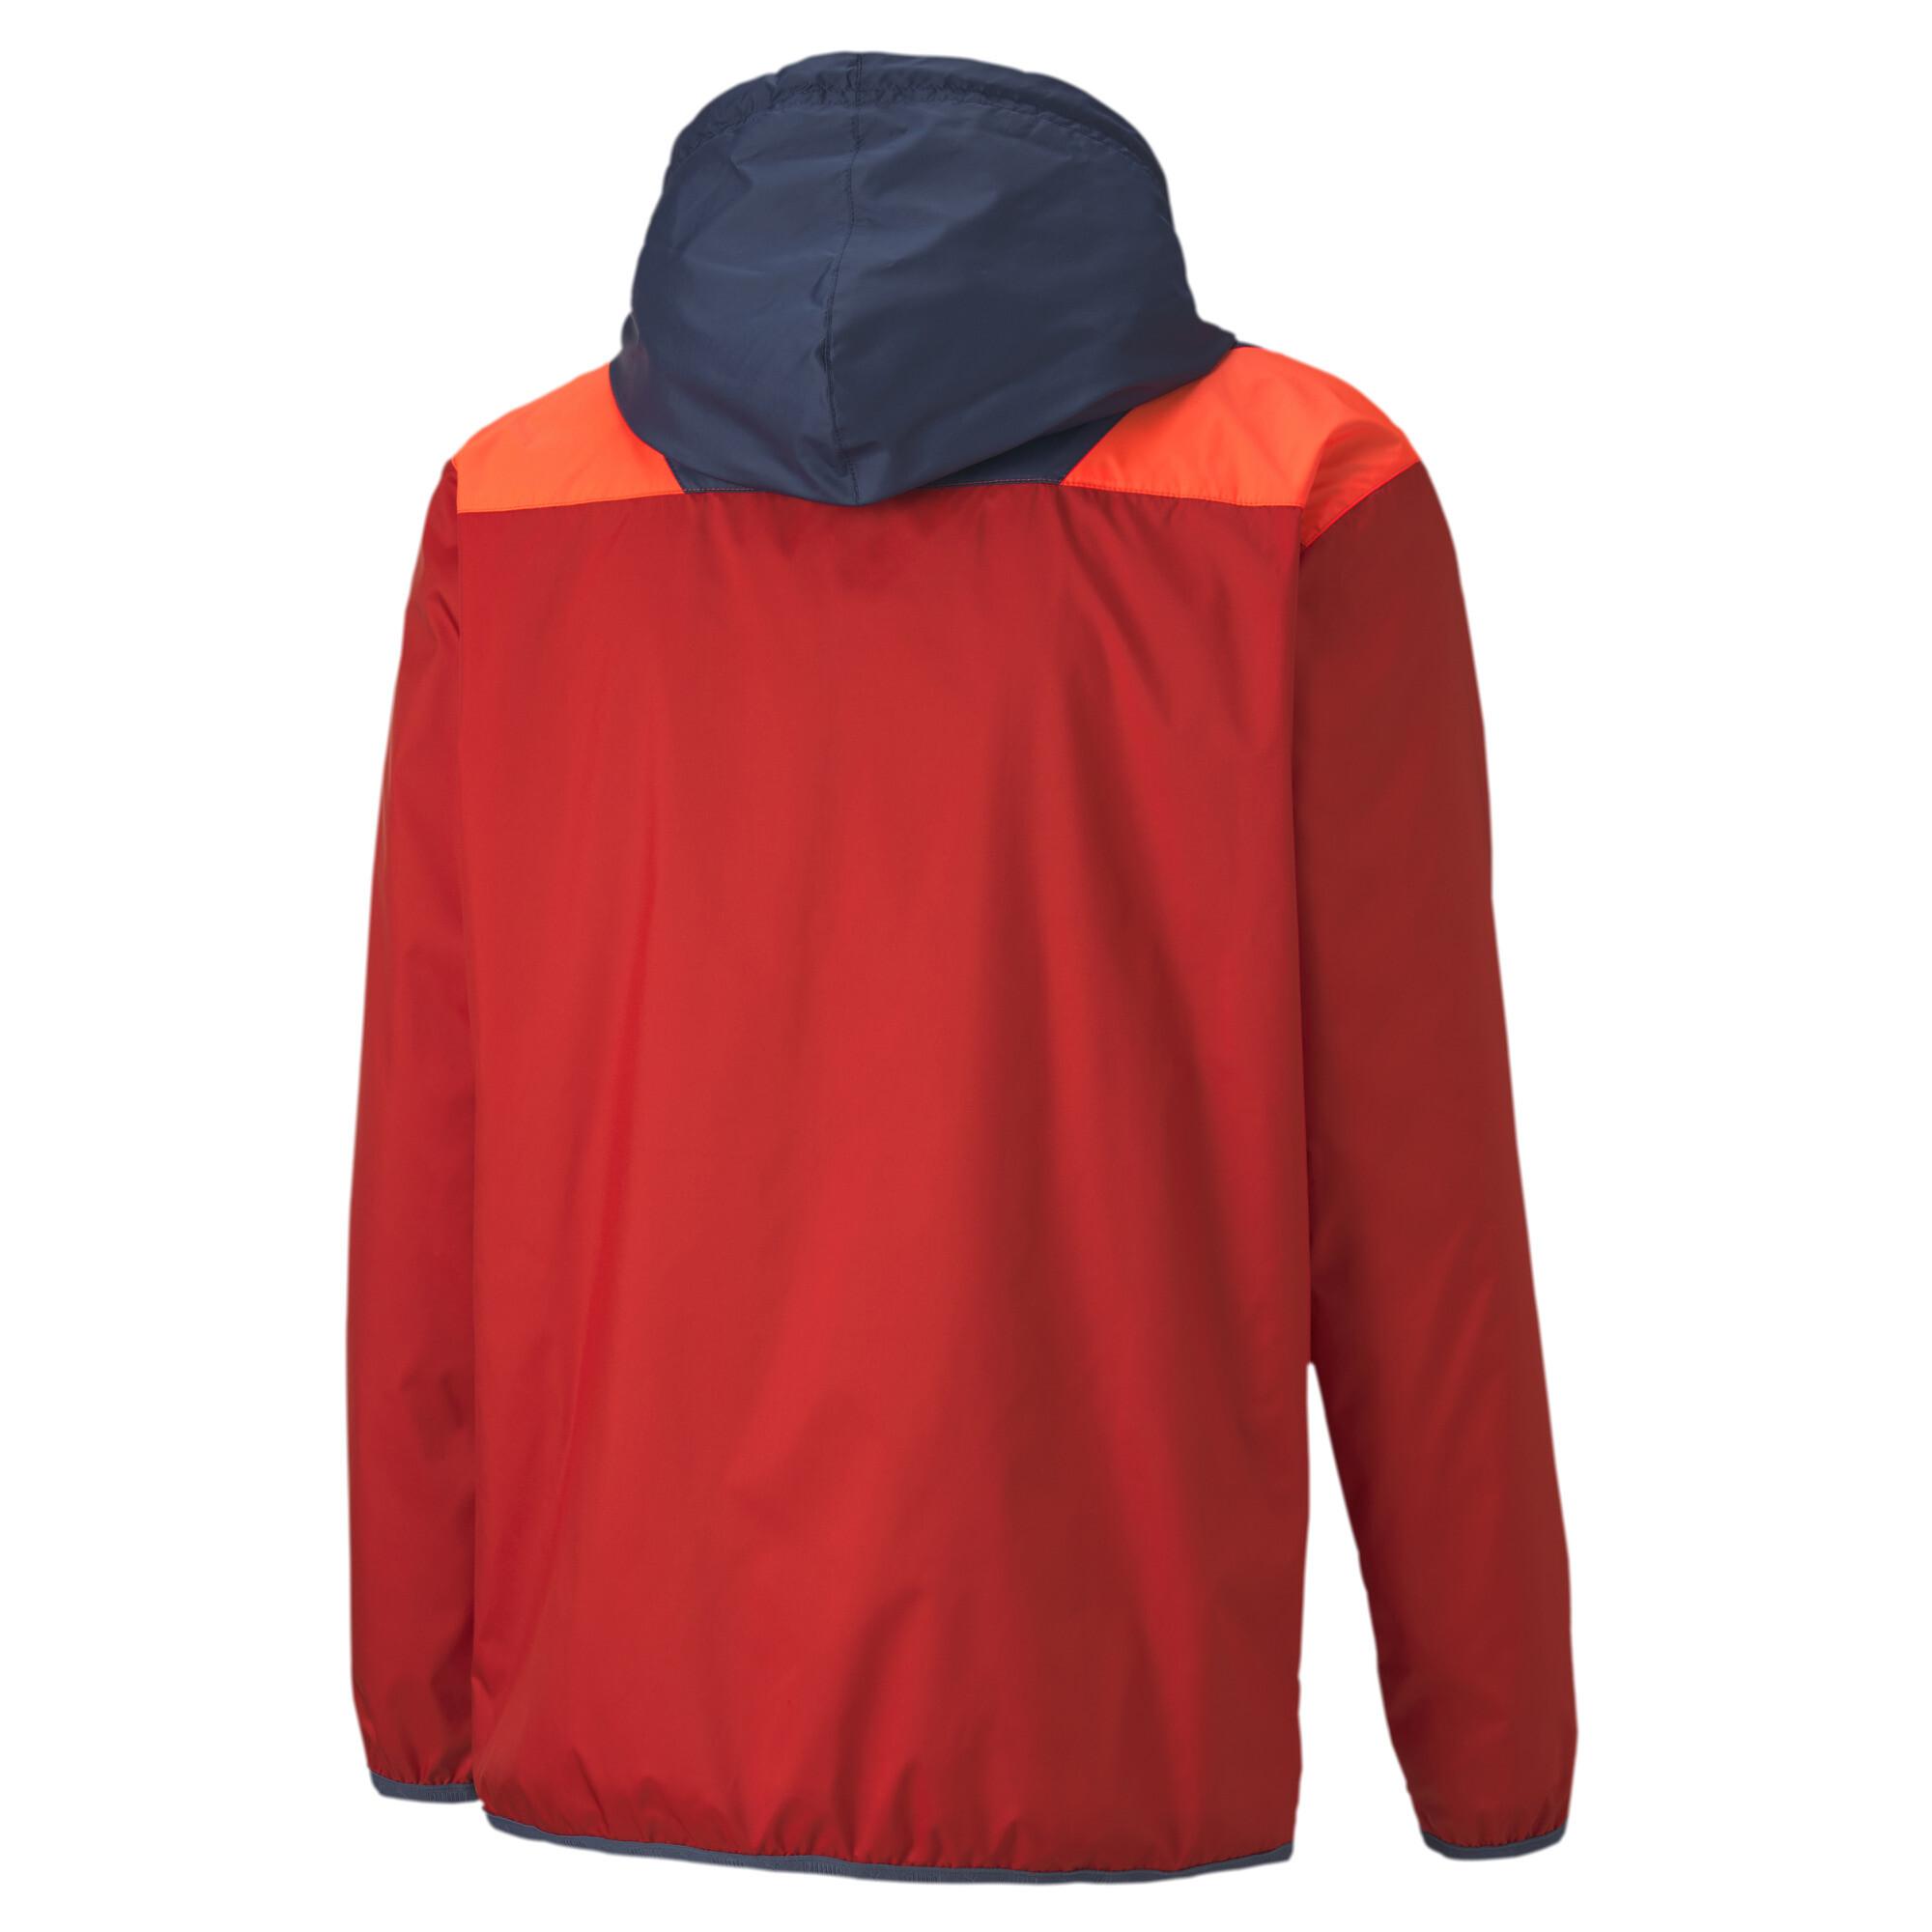 PUMA-Men-039-s-Reactive-Woven-Training-Jacket thumbnail 8